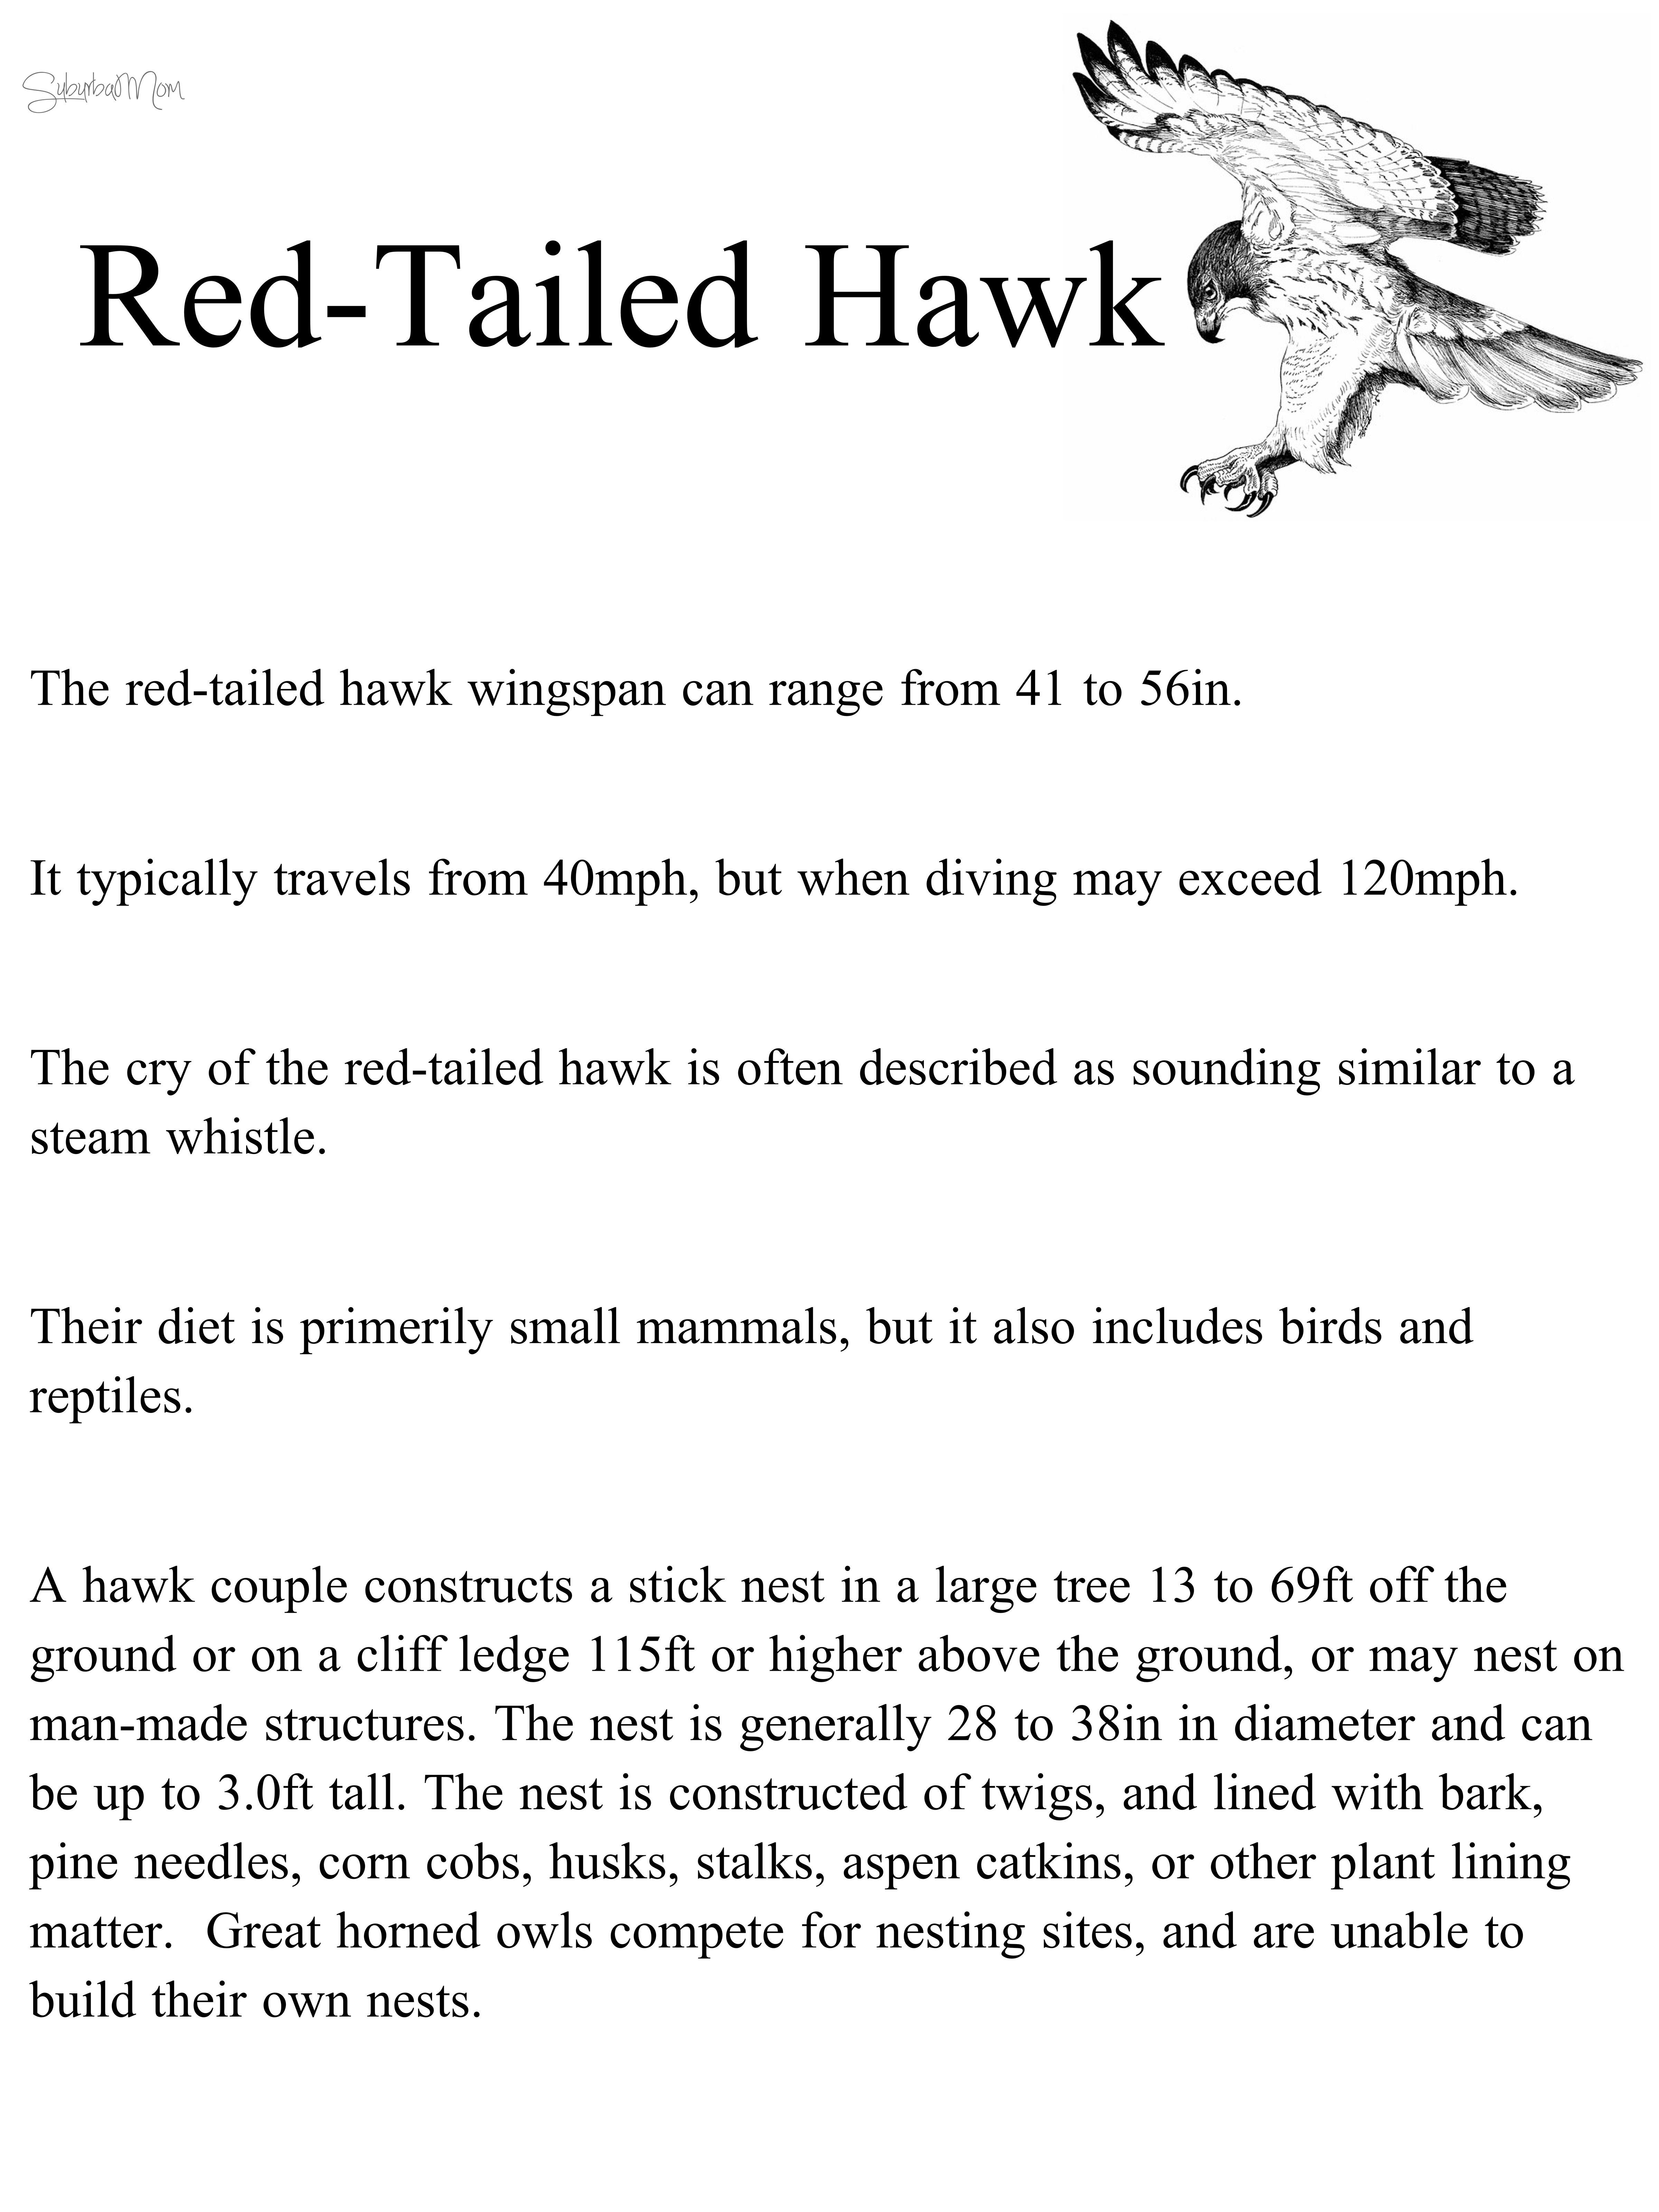 Hawk Red Tailed Hawk Habitat Science Natural Science